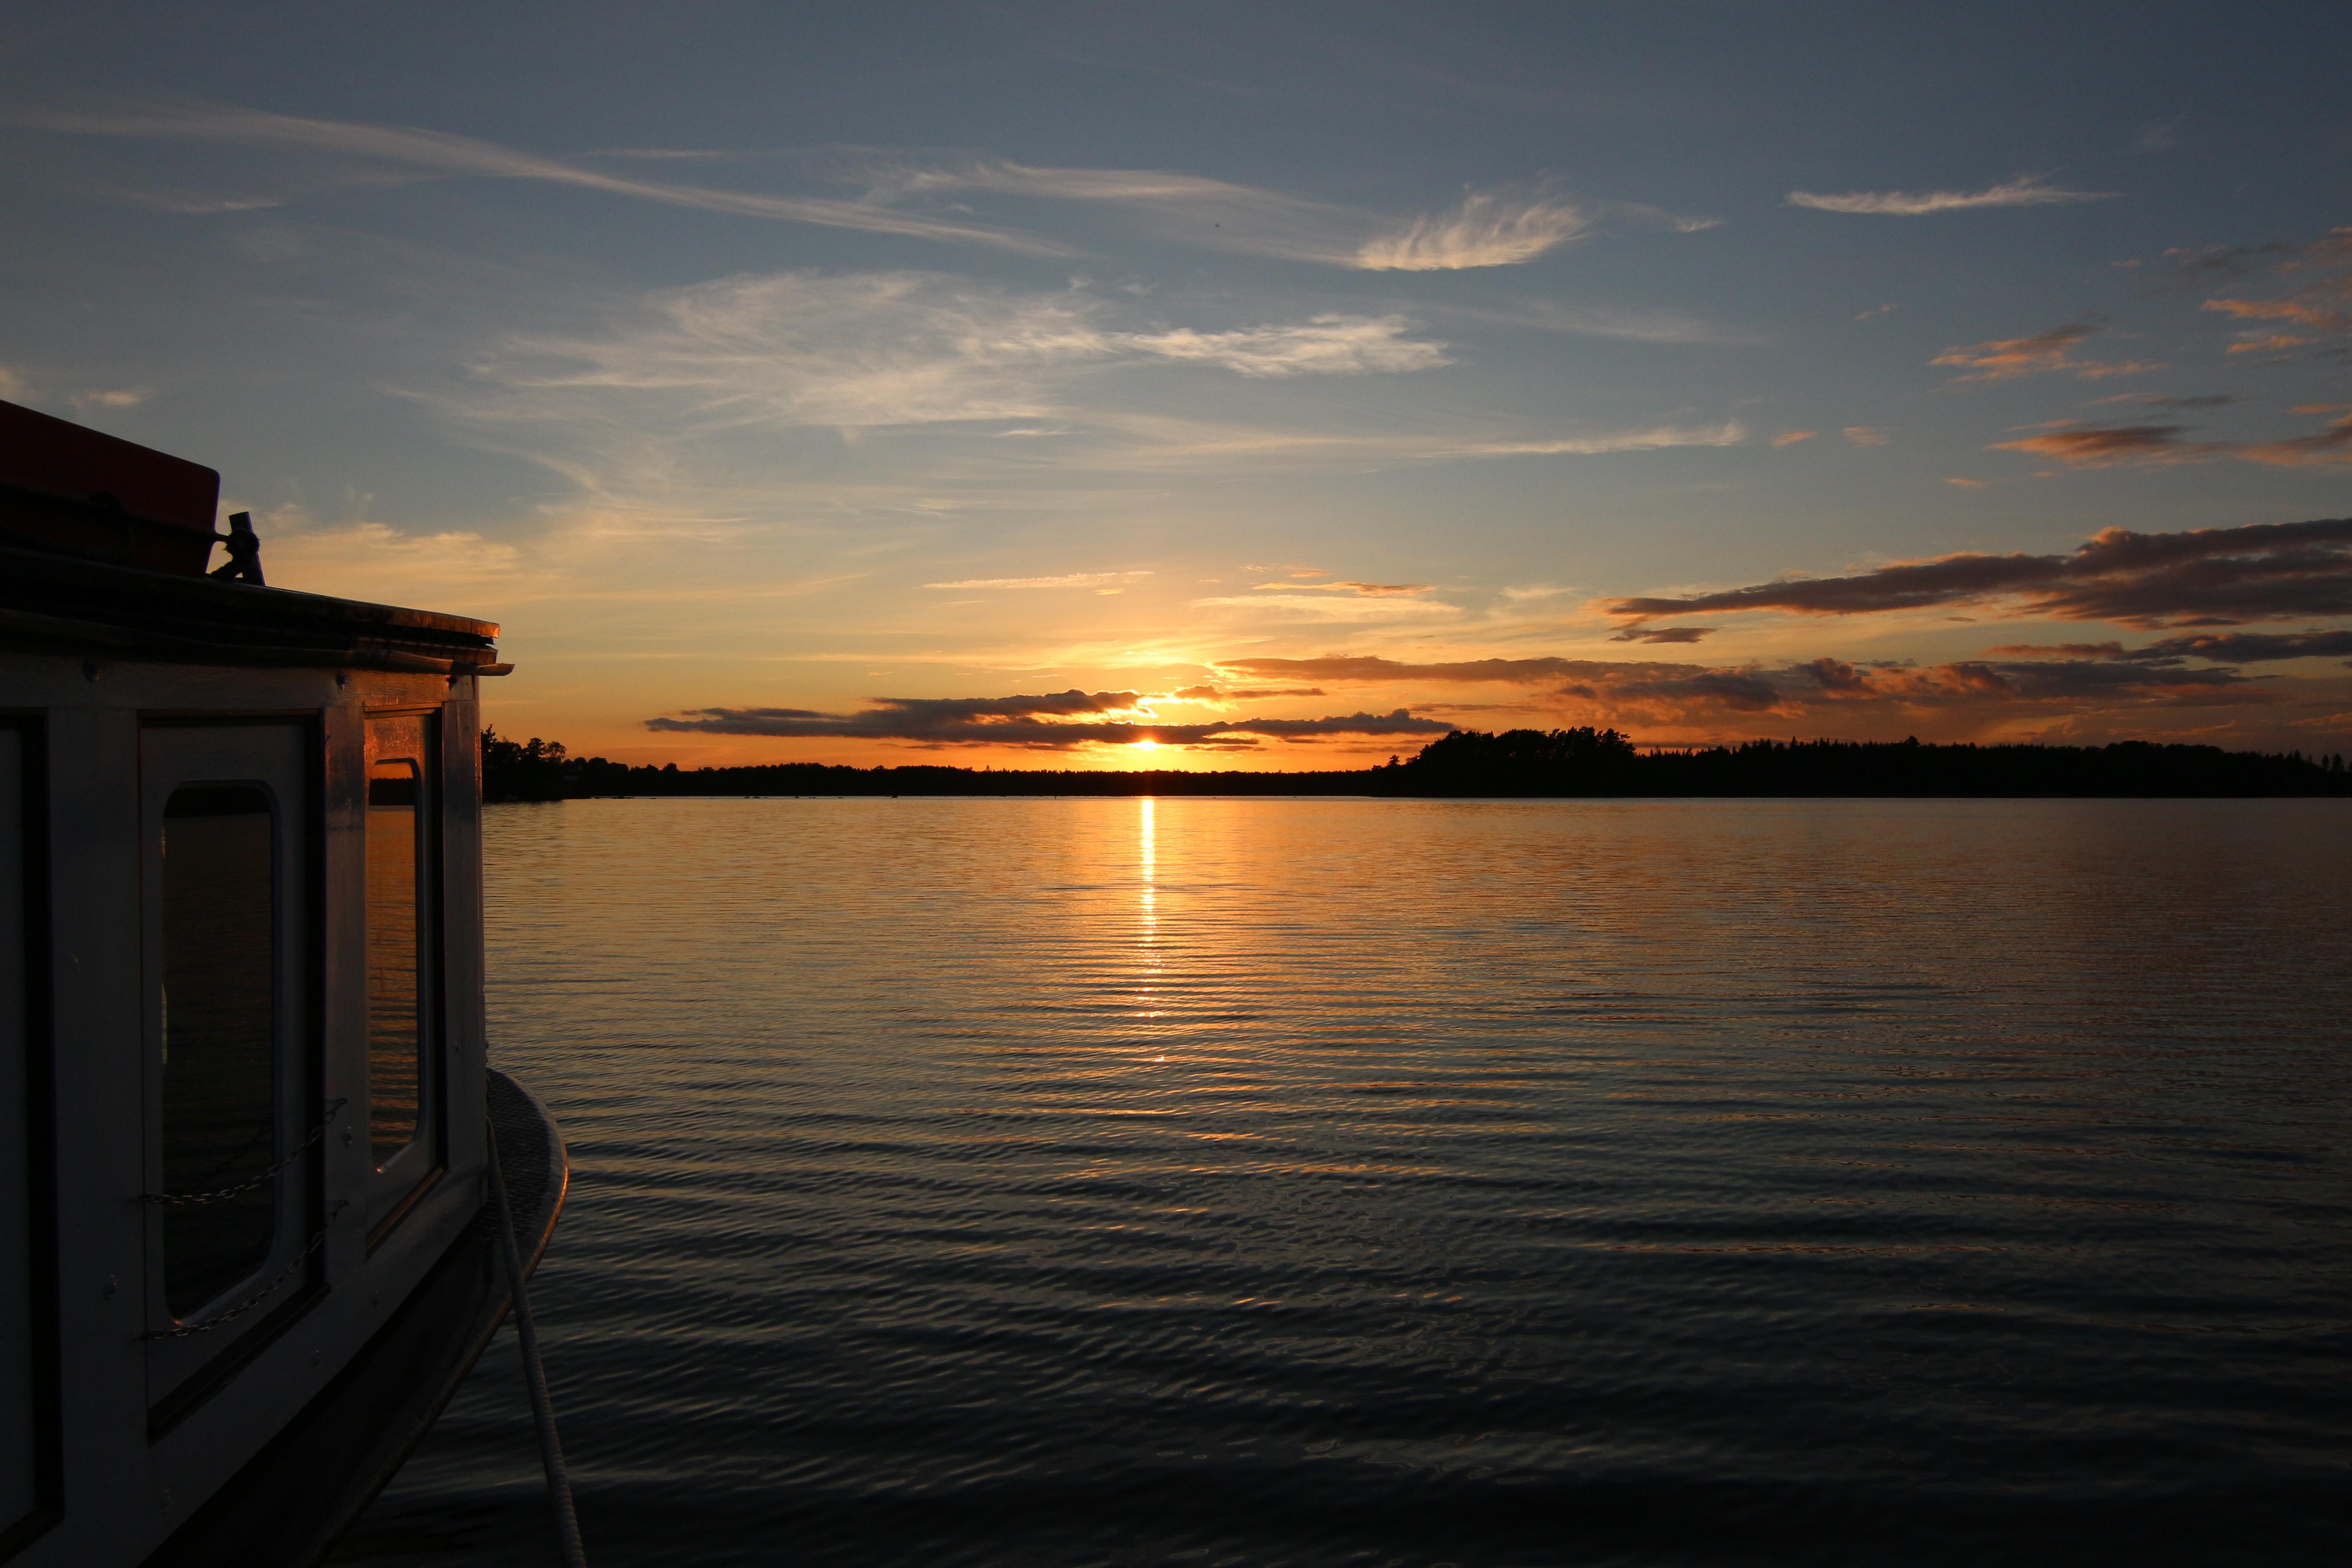 Växjö, Sweden